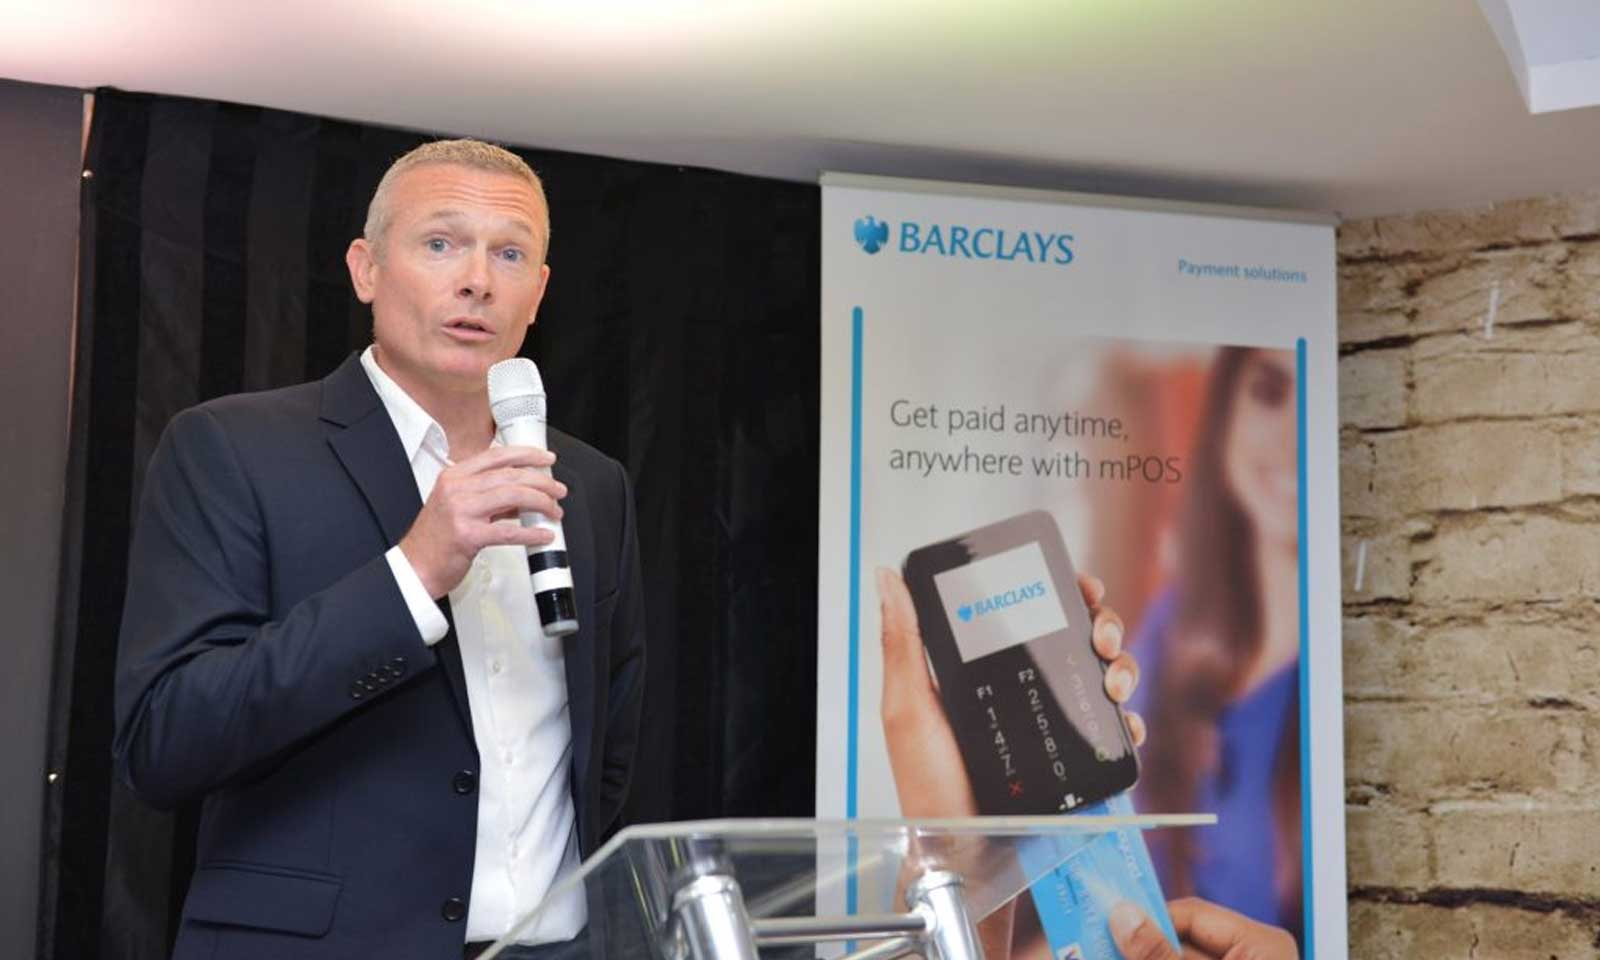 Barclays terminal mPOS